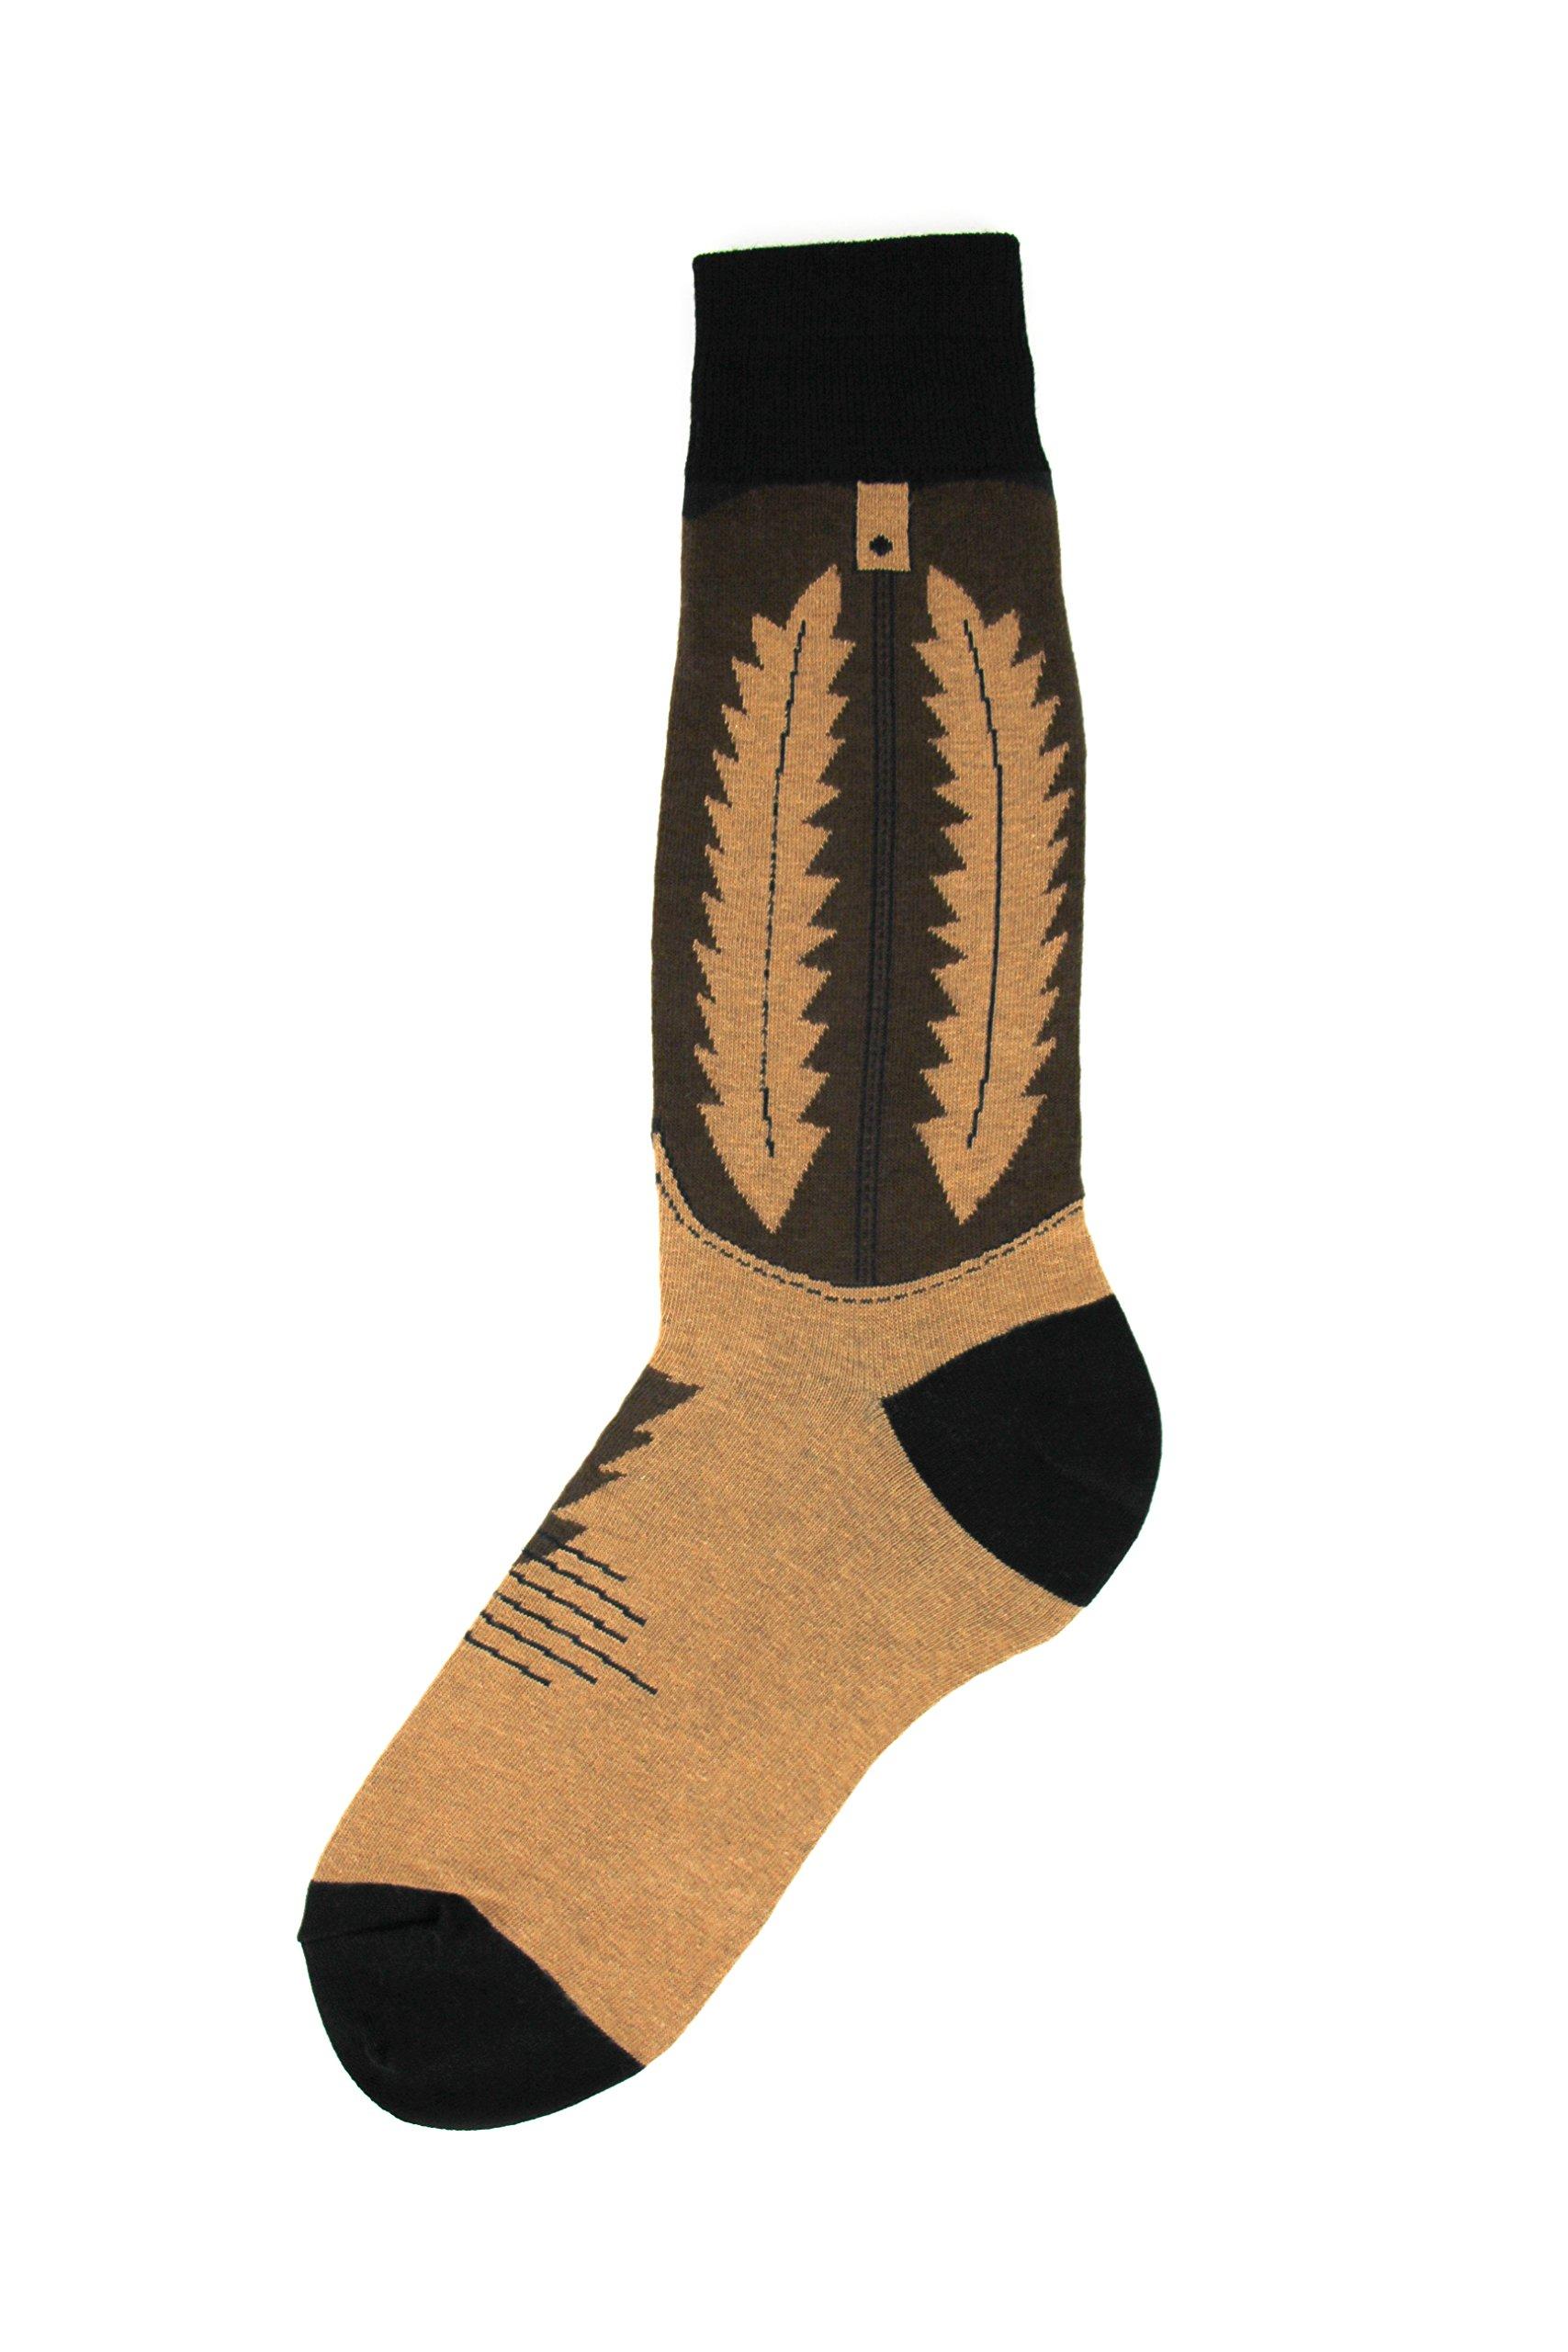 Foot Traffic - Men's Wacky Novelty Socks, Cowboy Boot (Shoe Sizes 7-12)